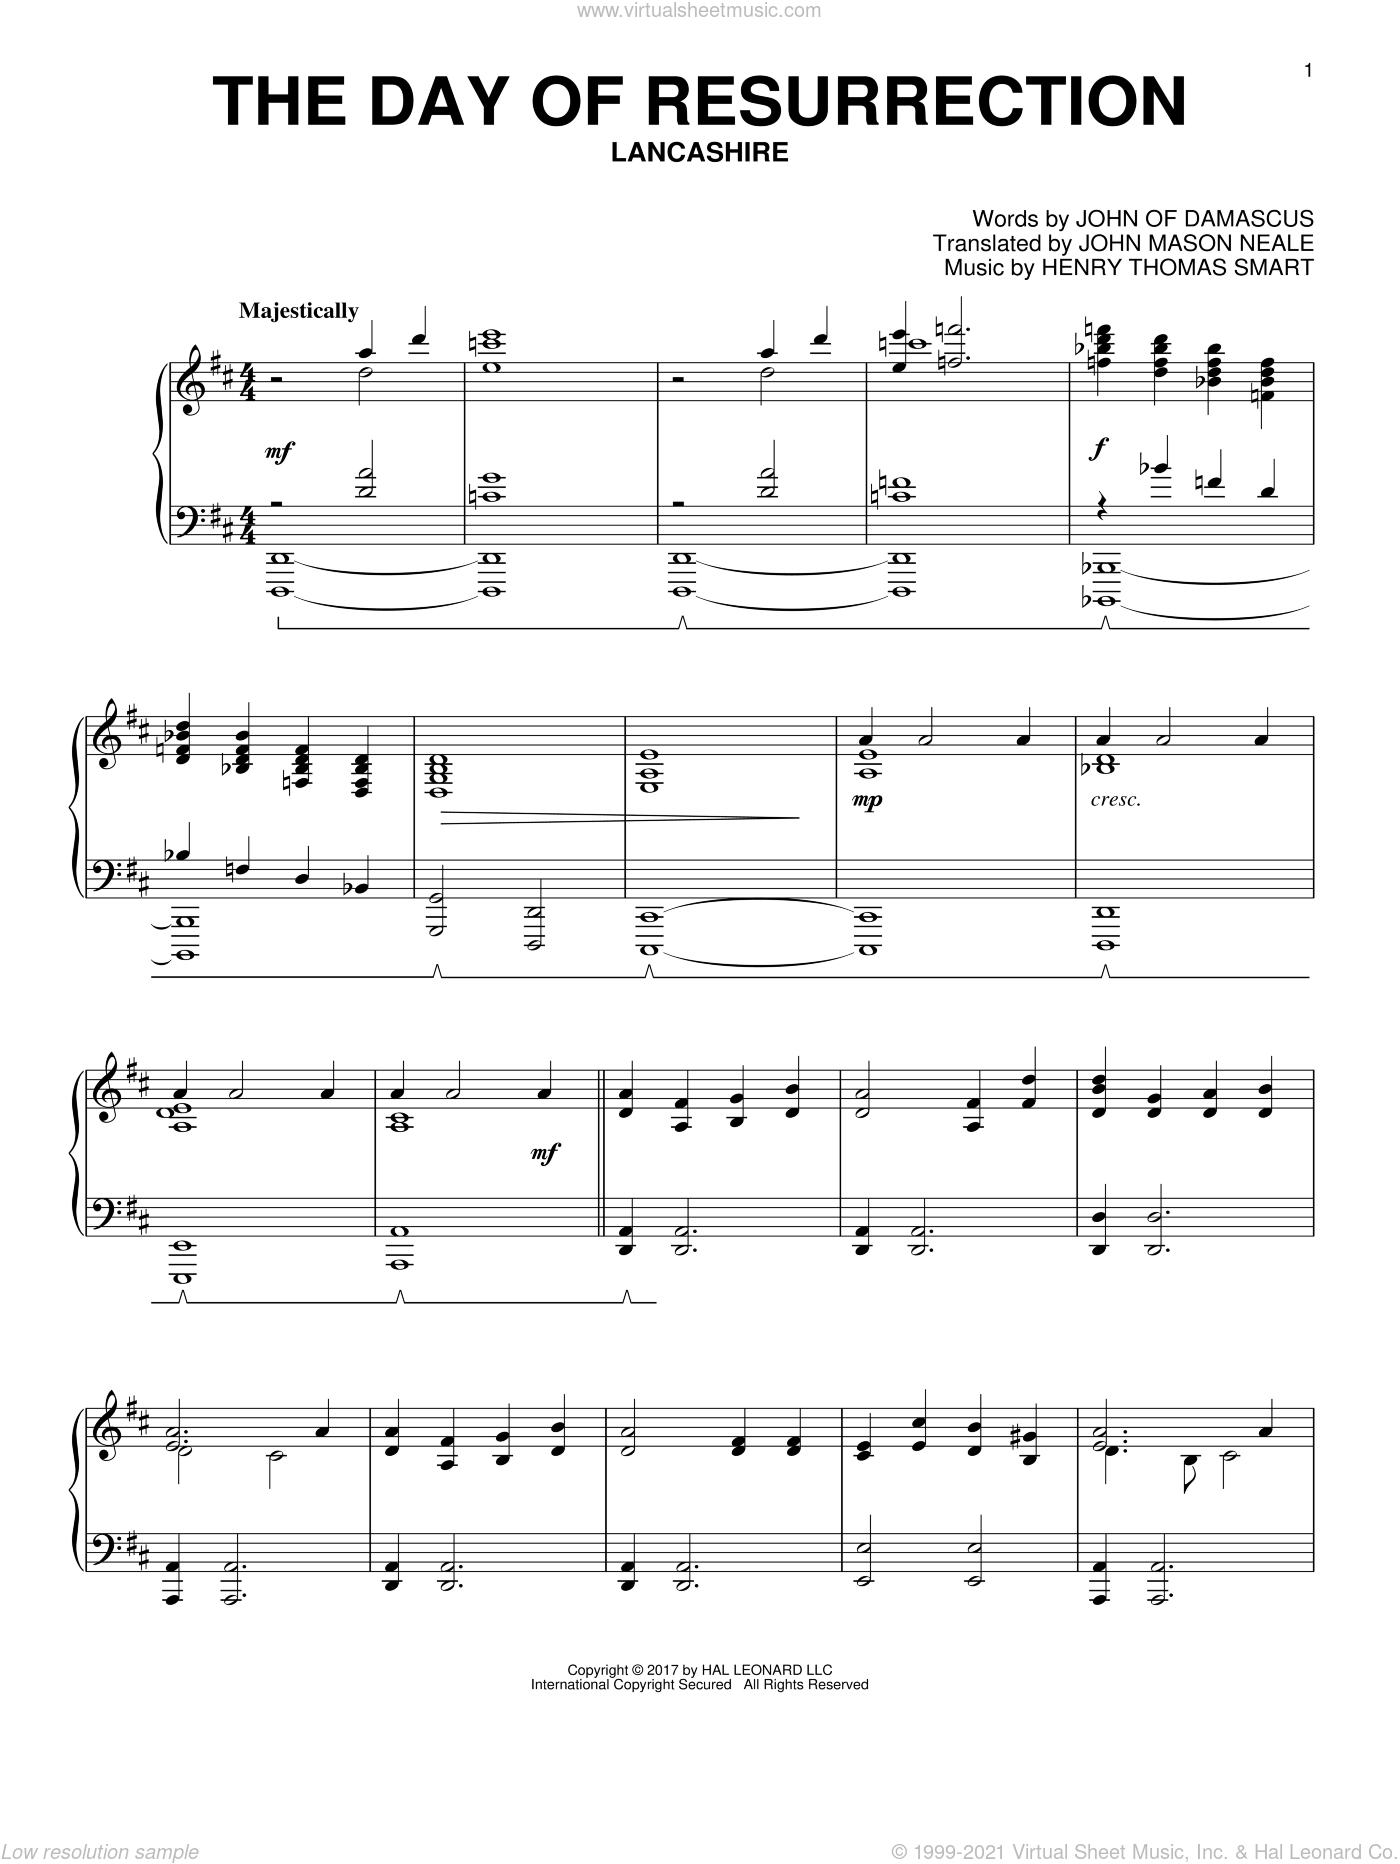 The Day Of Resurrection sheet music for piano solo by John Mason Neale, Henry Thomas Smart and John of Damascus, intermediate skill level